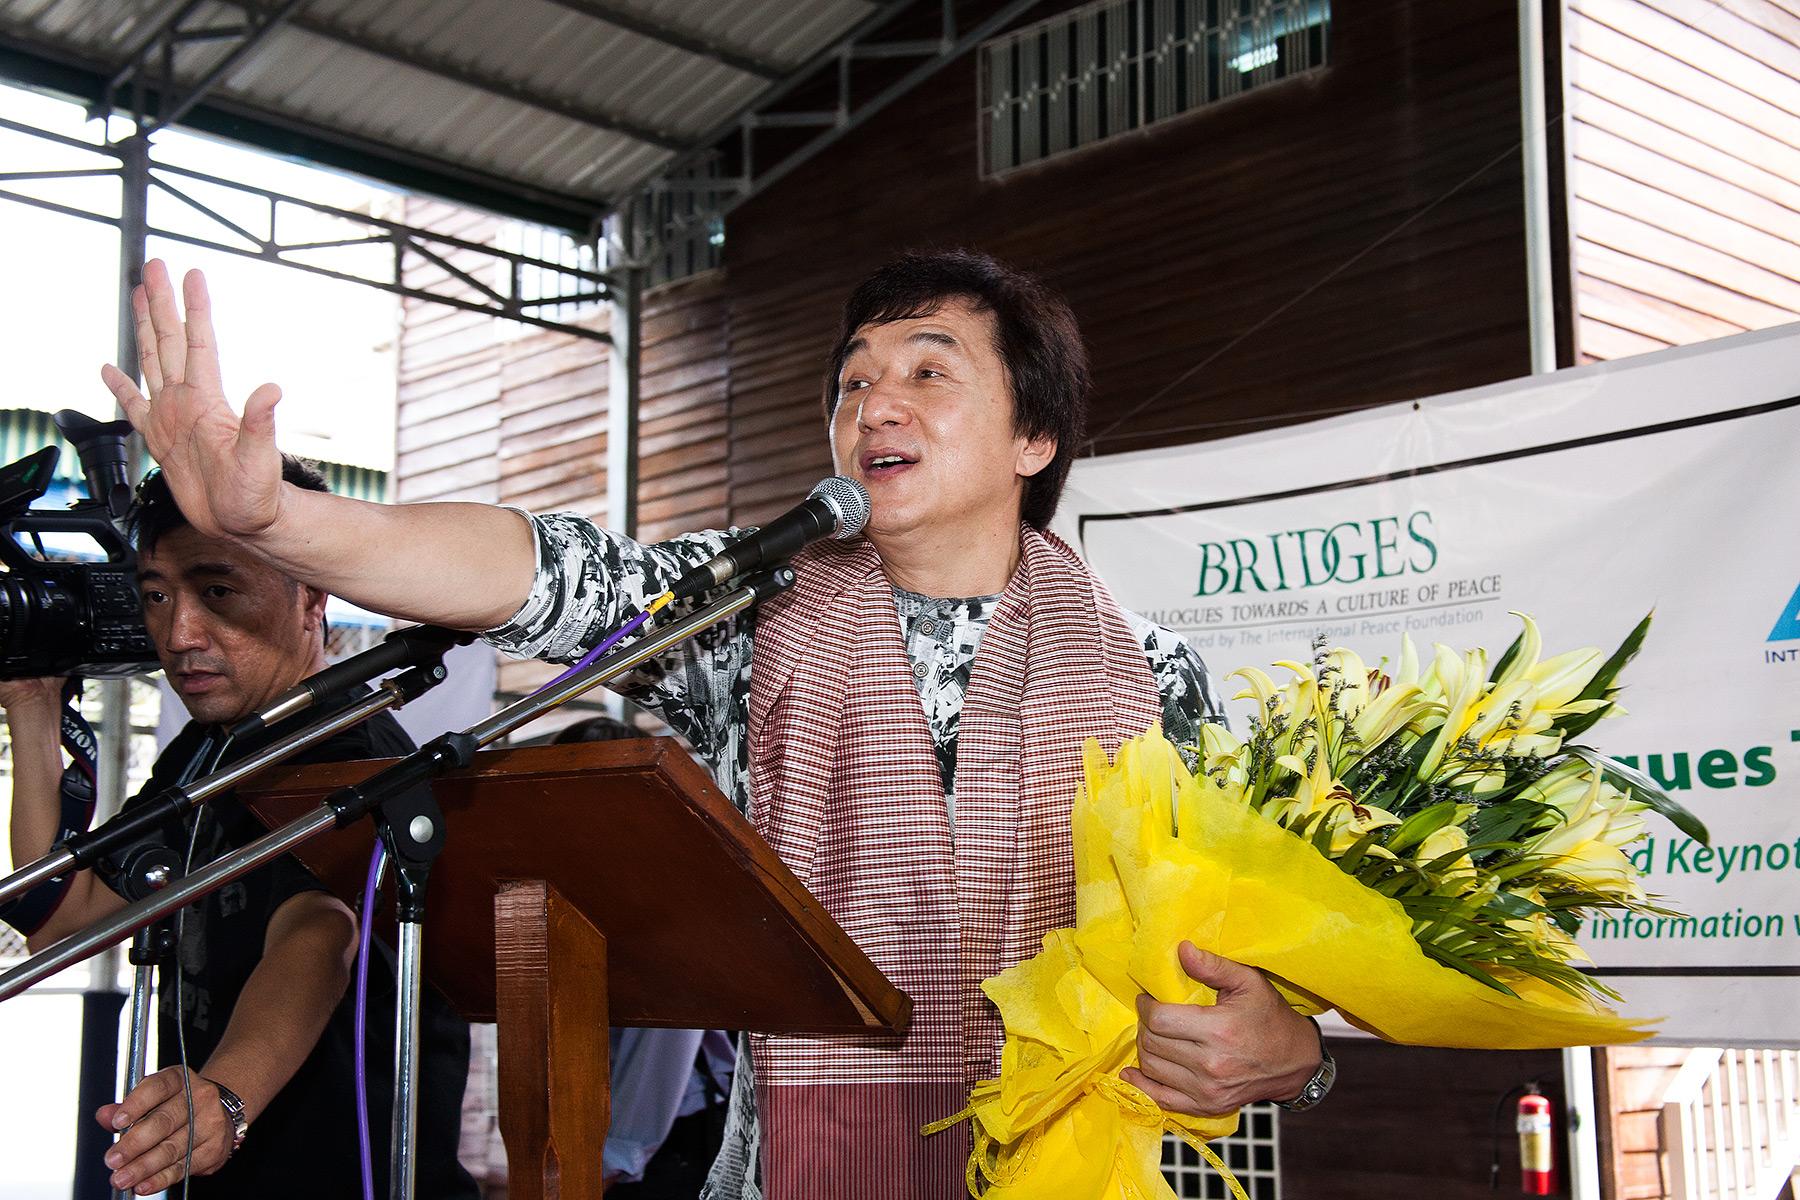 Jackie Chan, ISPP School, Phnom Penh, Bridges Int. Peace Foundation